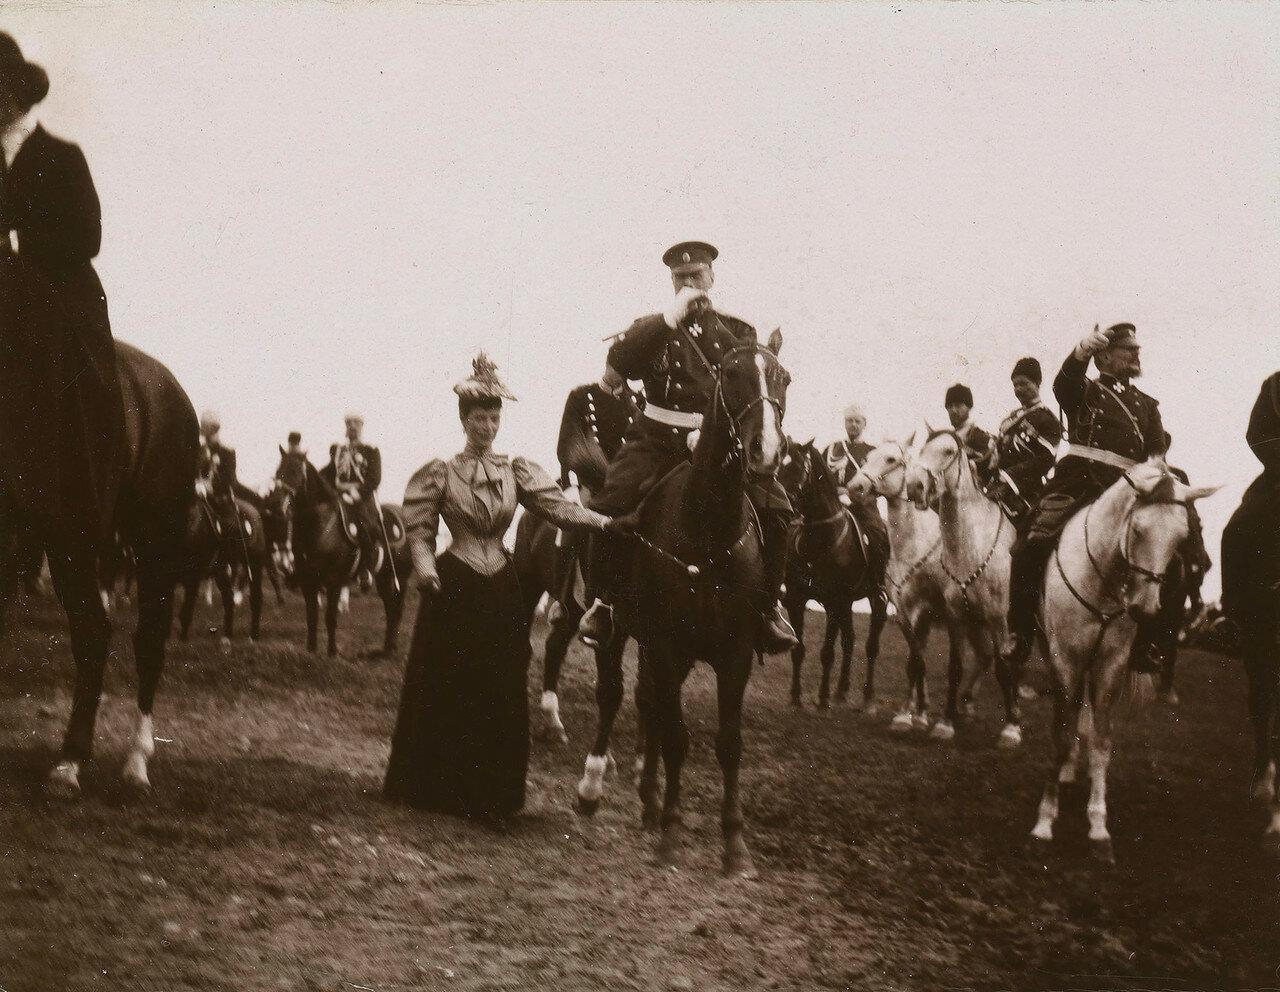 1892. Александр III и Мария Федоровна на военном параде